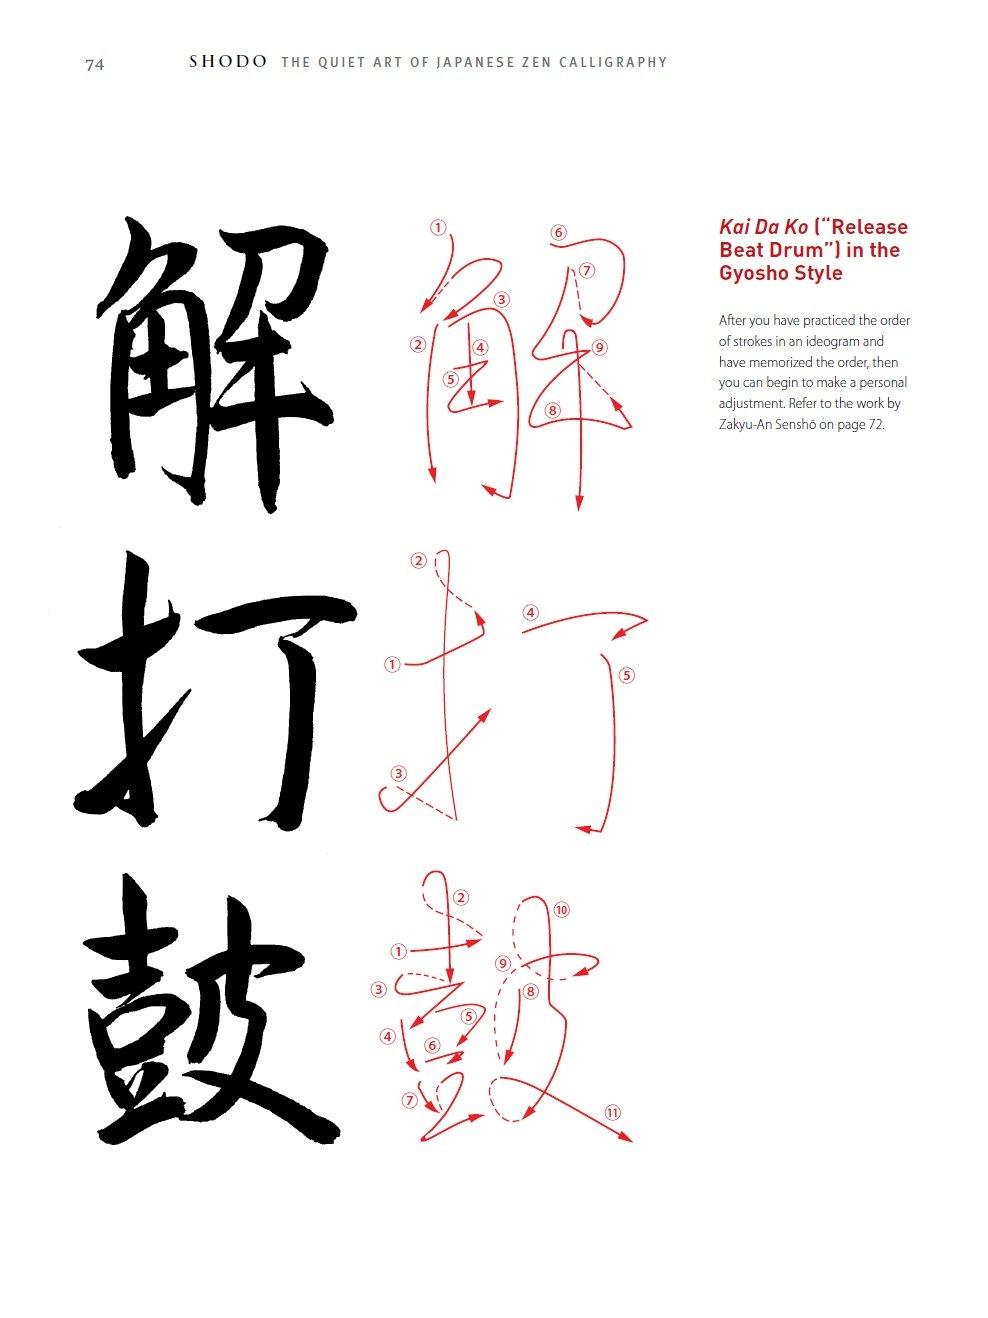 6a3158a88 Shodo: The Quiet Art of Japanese Zen Calligraphy, Learn the Wisdom of Zen  Through Traditional Brush Painting: Shozo Sato, Alice Ogura Sato, ...